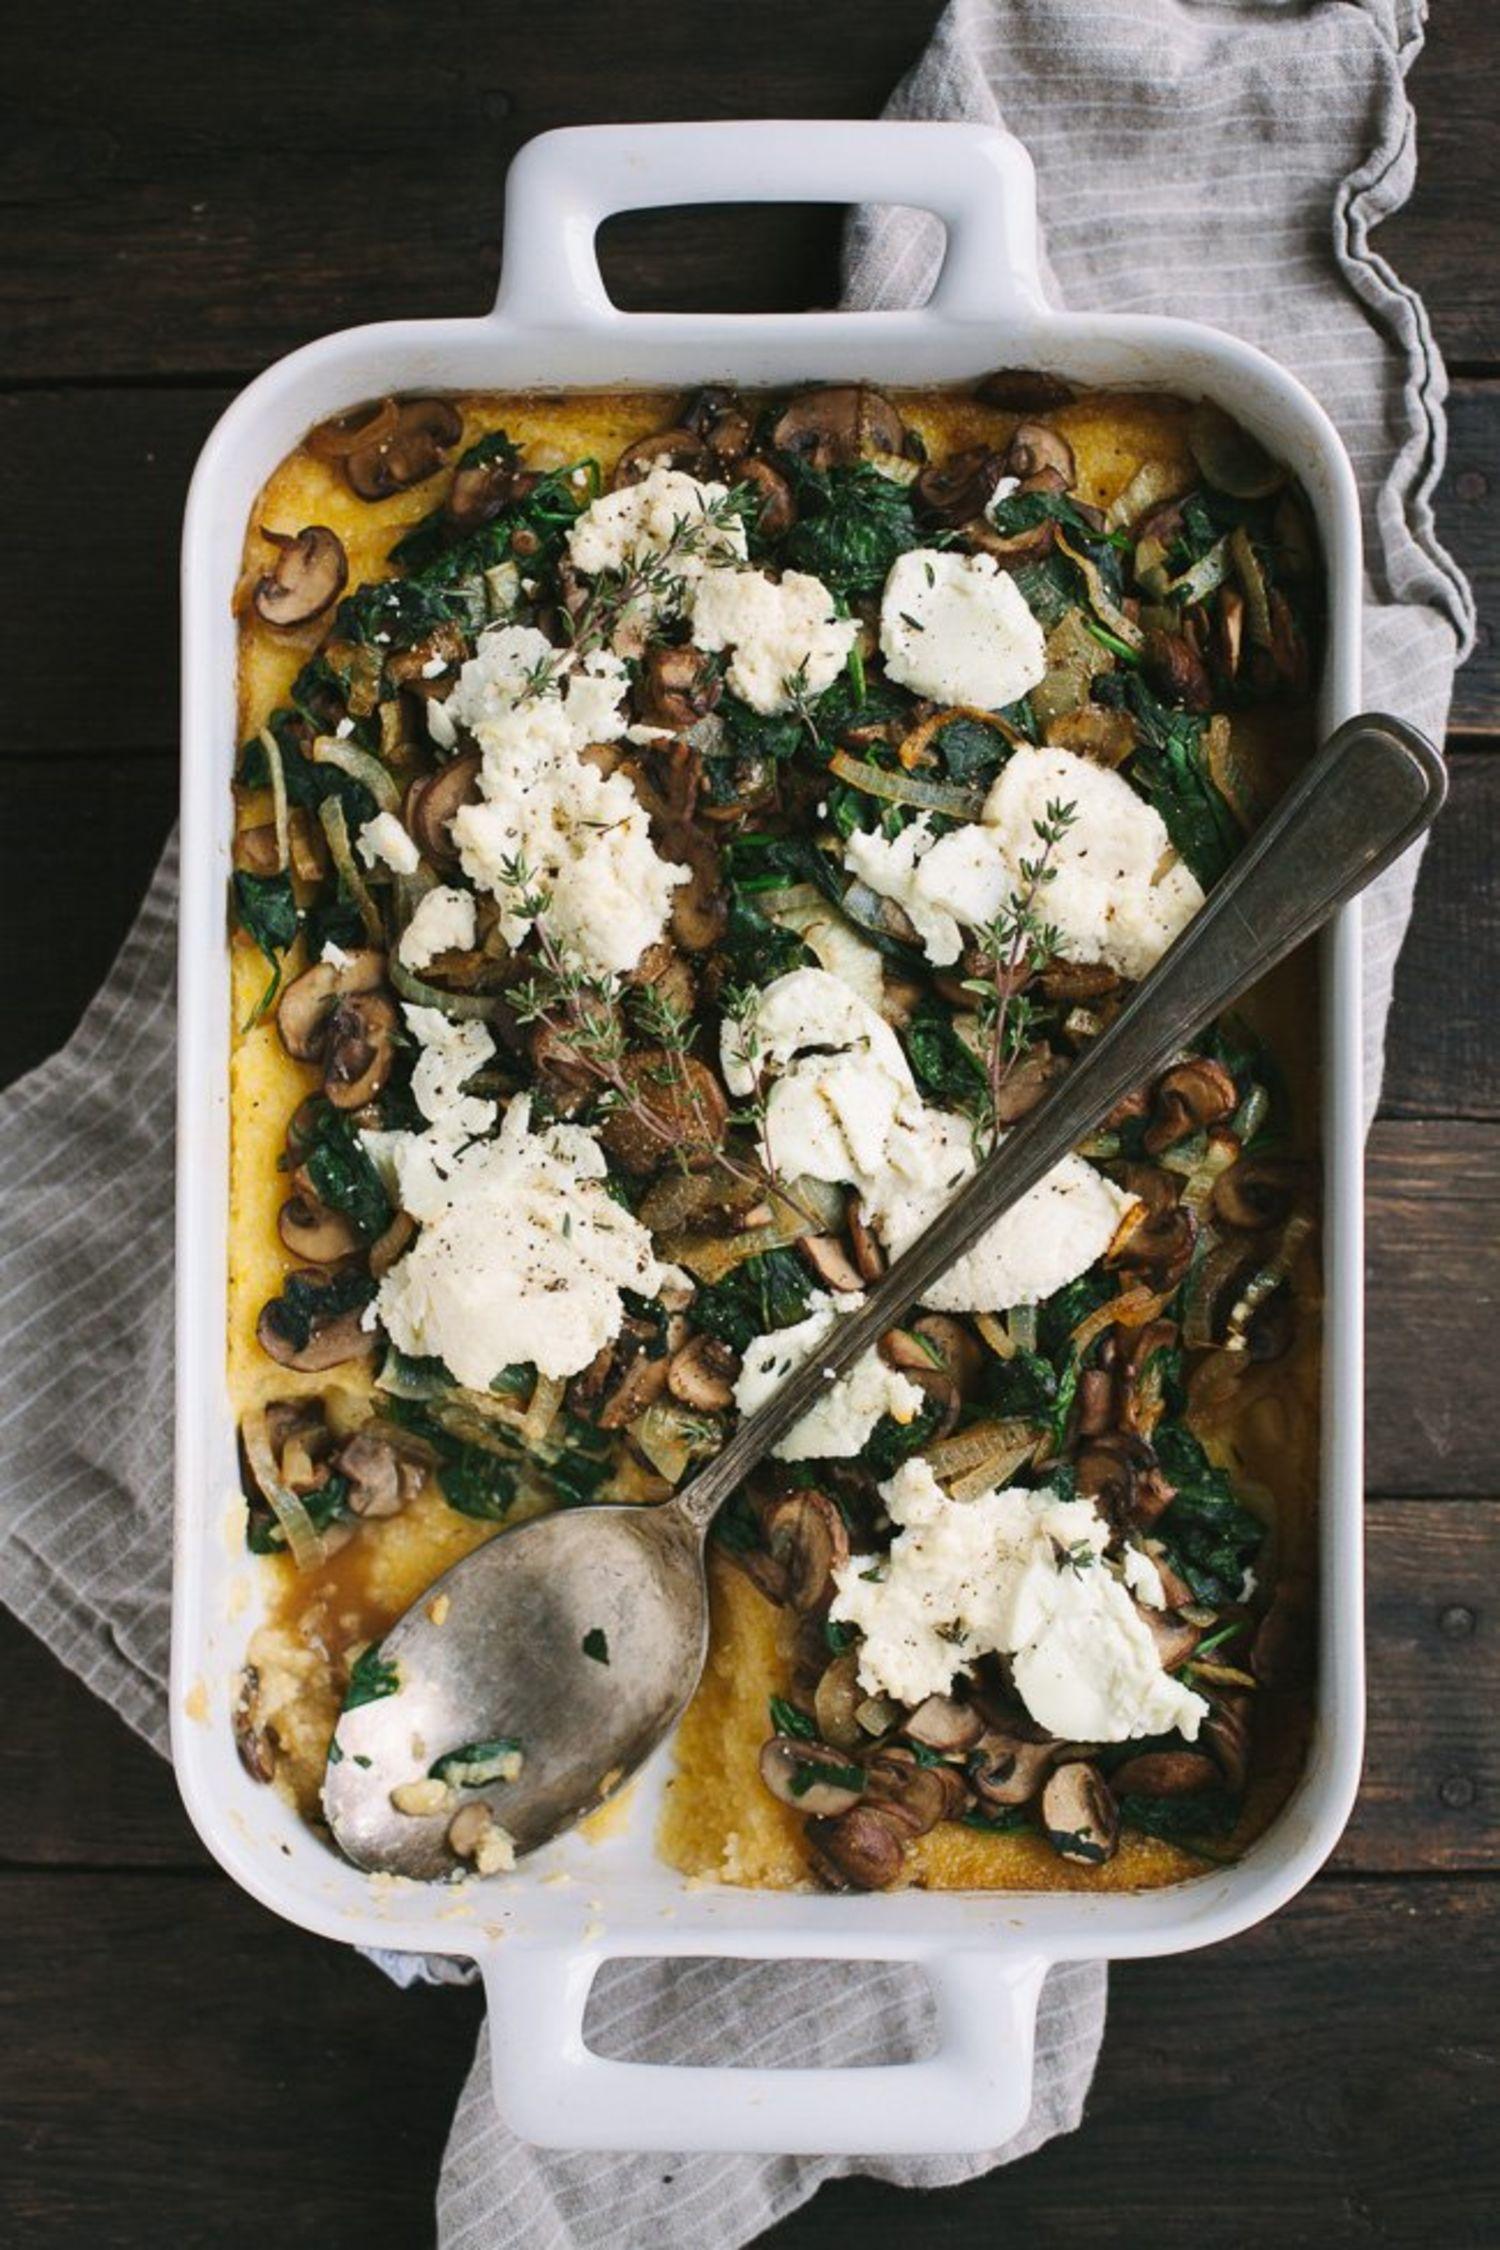 Make This Vegetarian Polenta Bake for Dinner & Eat the Leftovers for Brunch